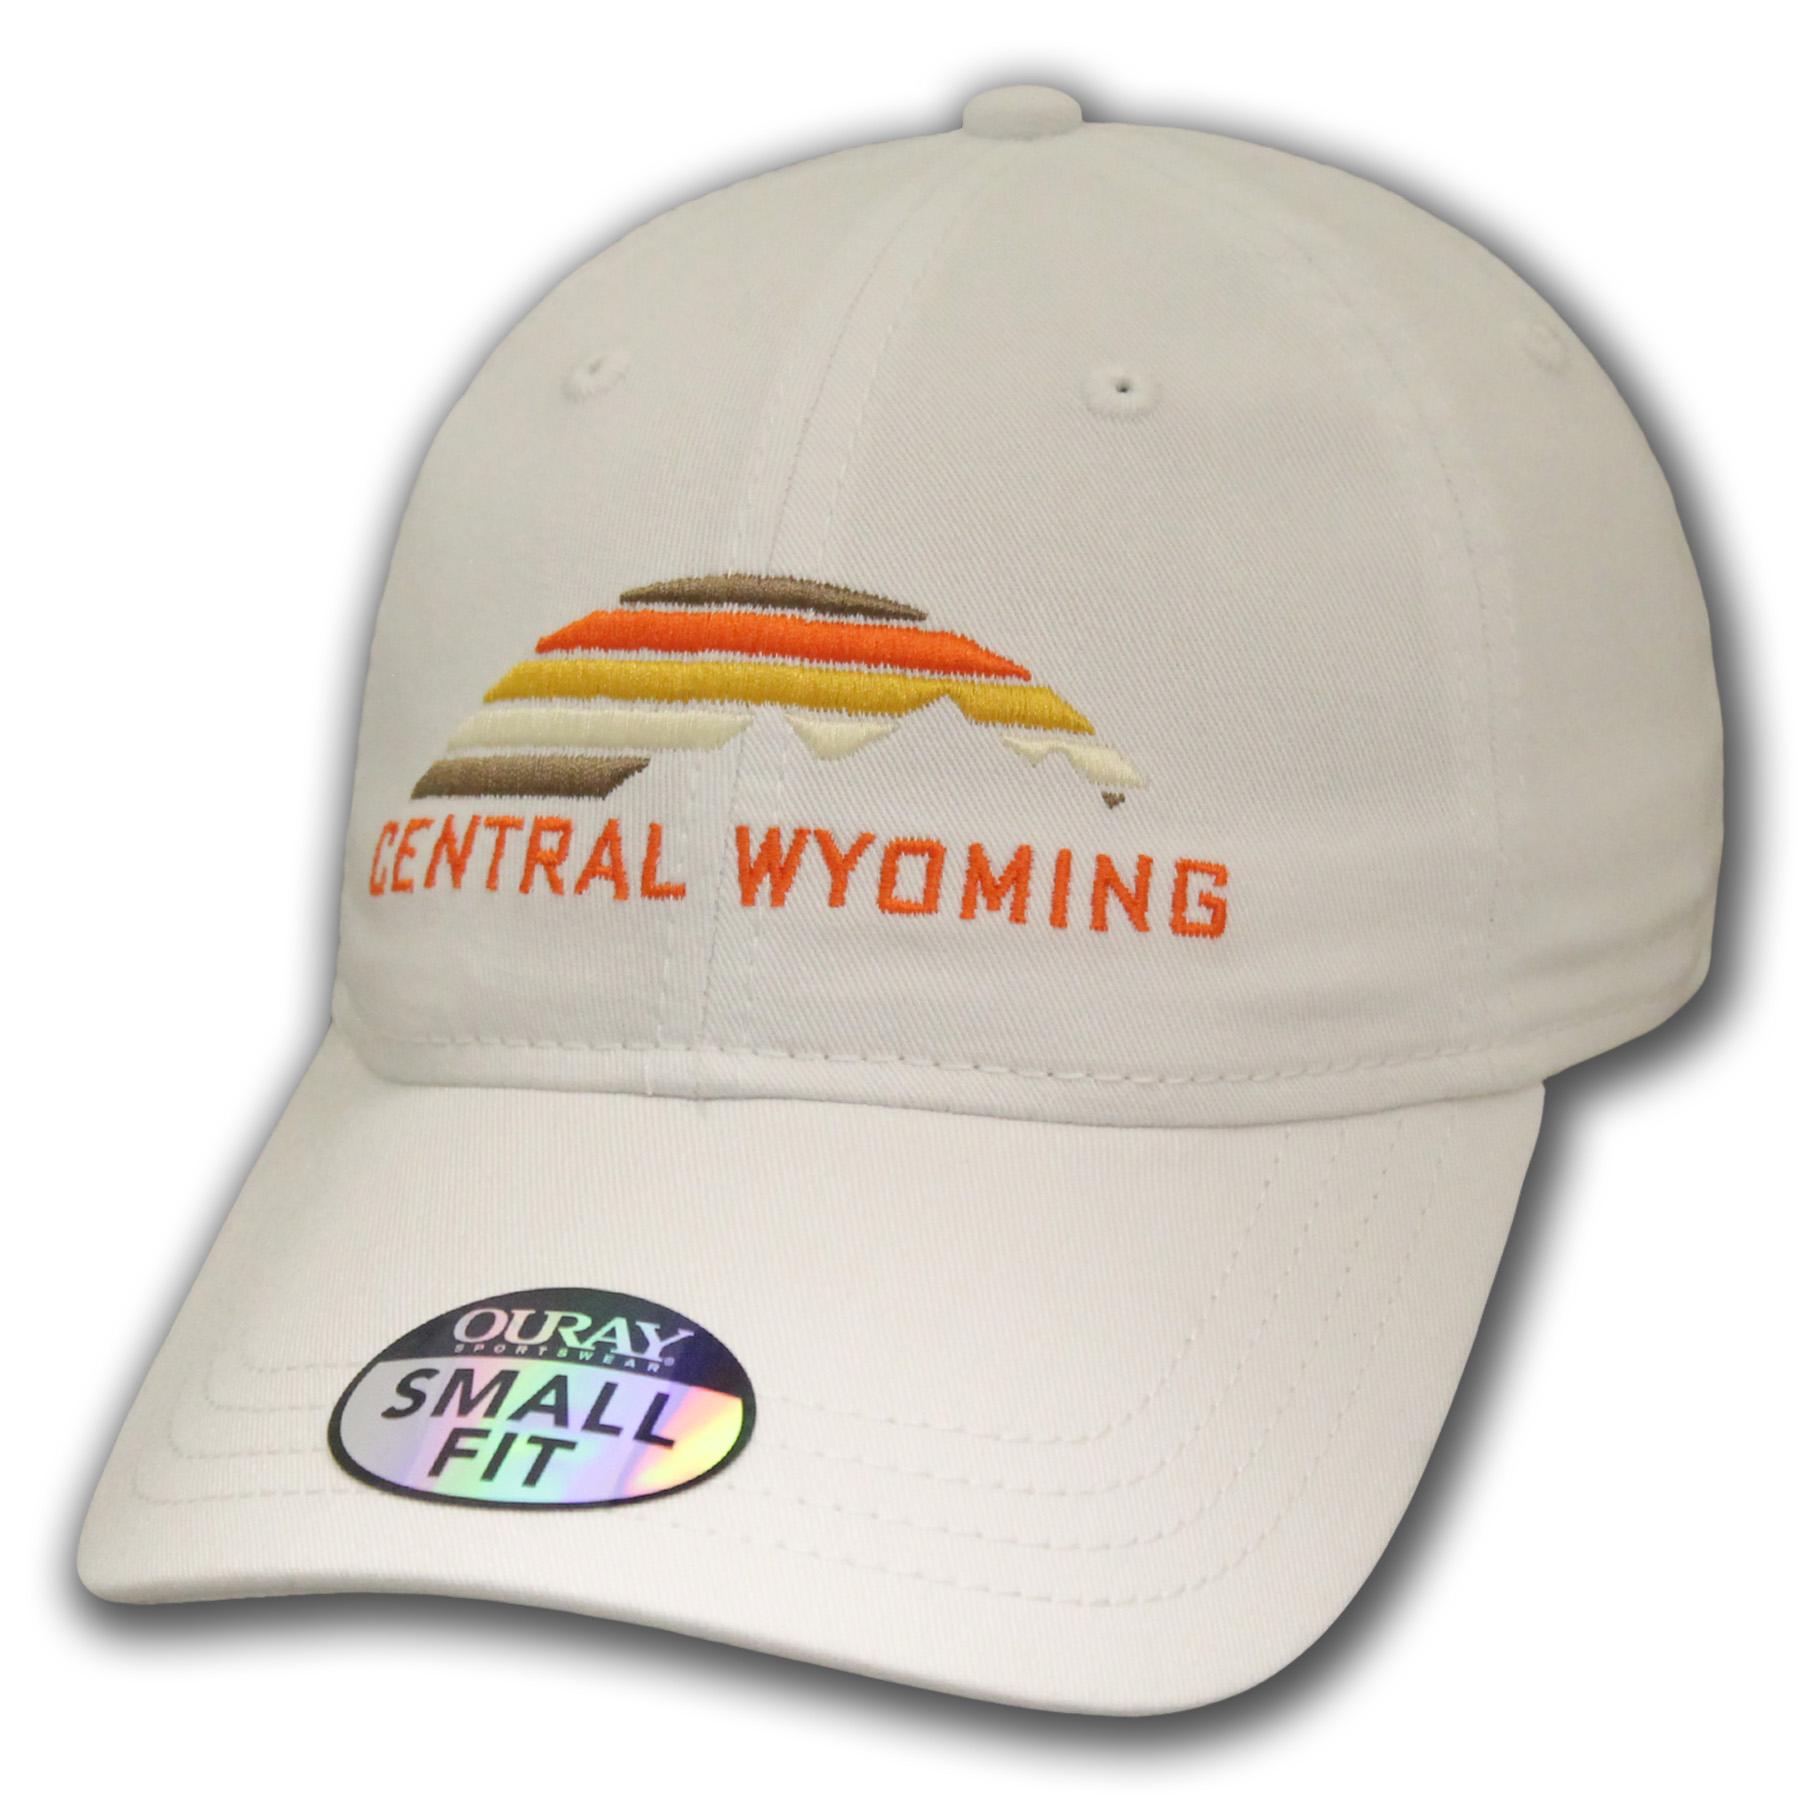 Central Wyoming Mountain Sunset Baseball Cap